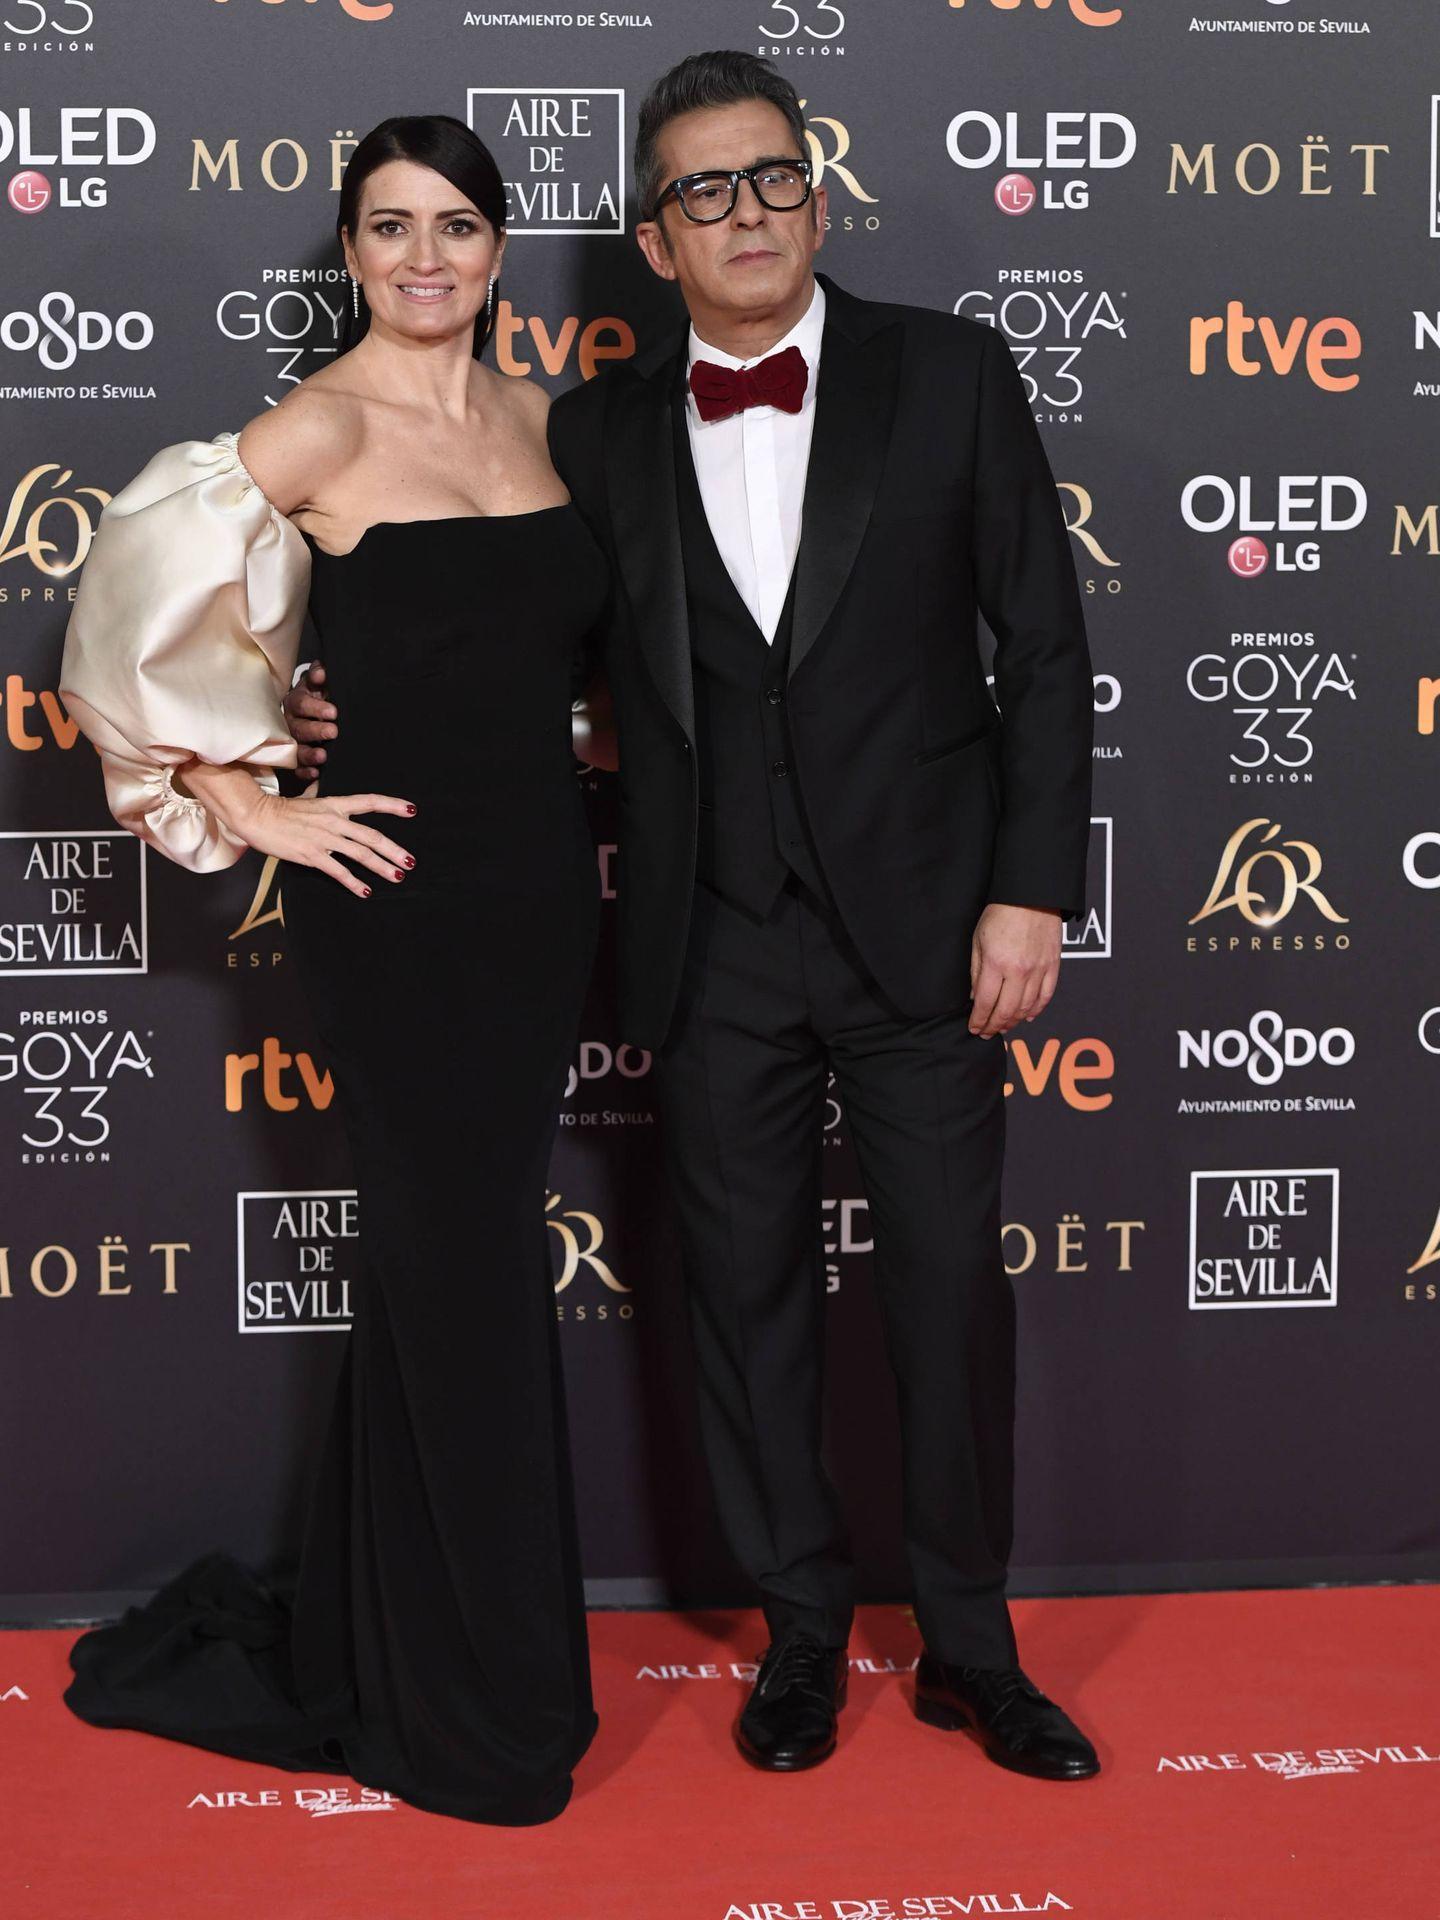 Silvia Abril y Andreu Buenafuente. (Limited Pictures)